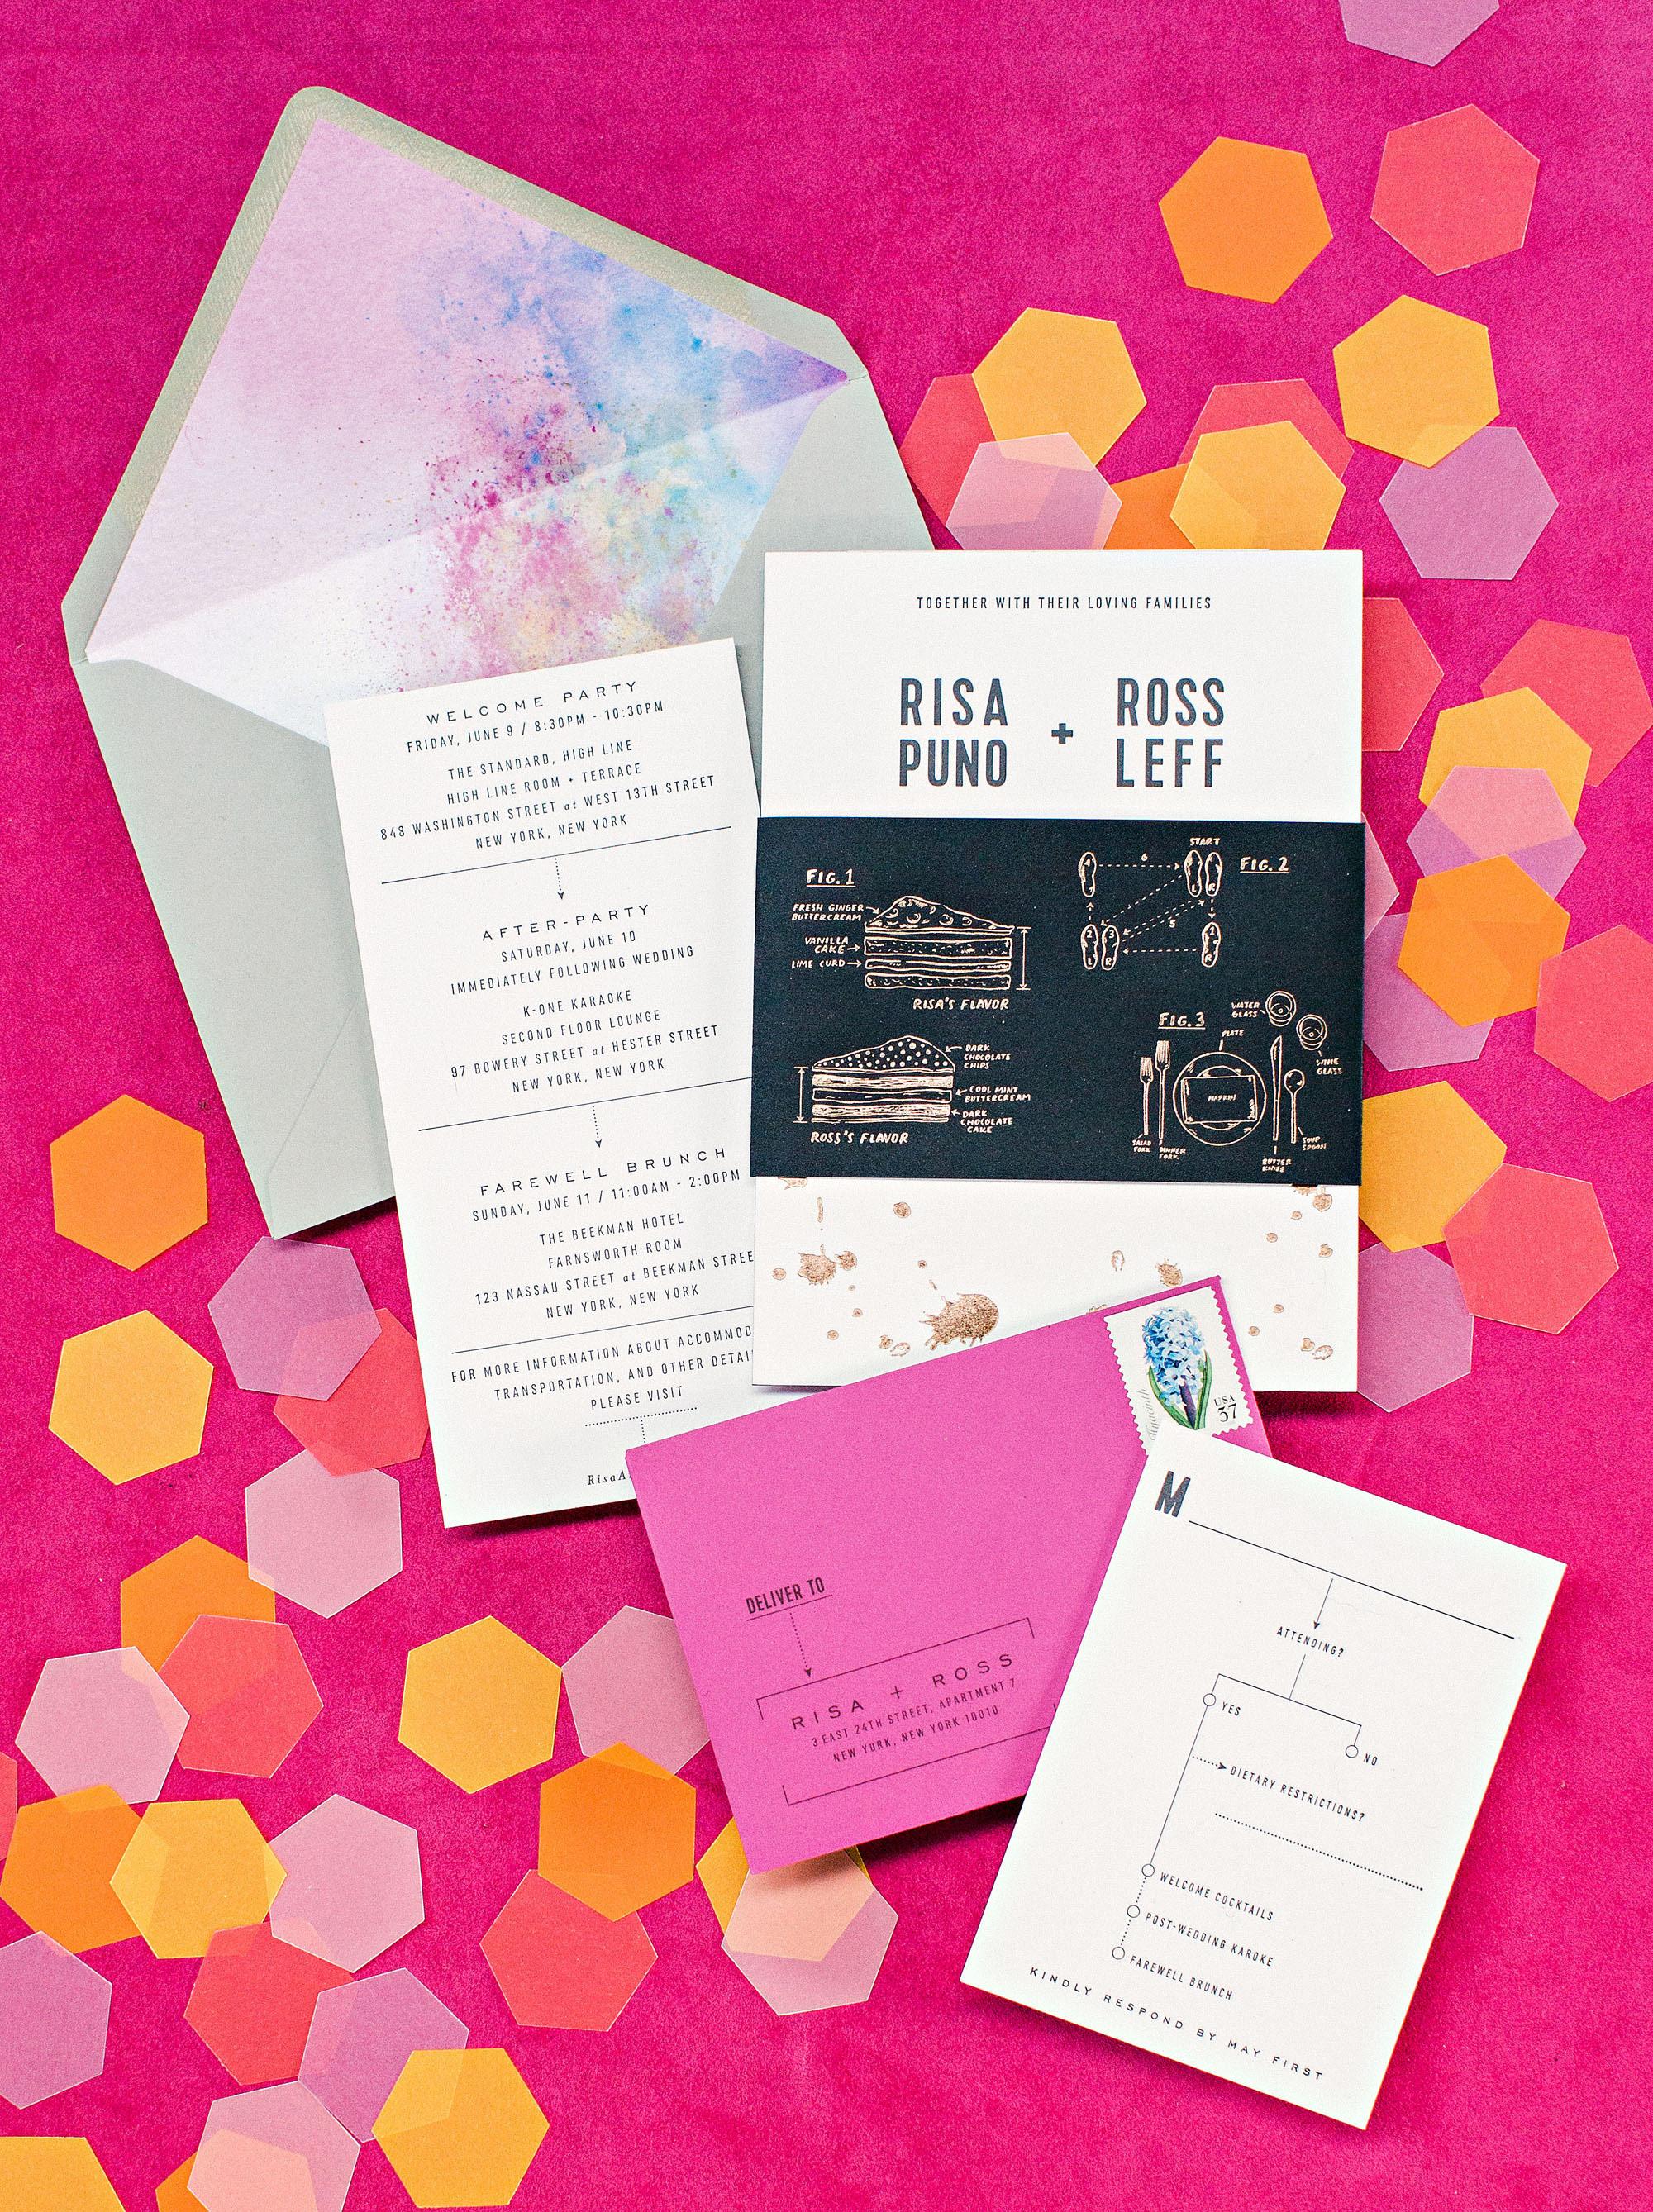 risa ross wedding brooklyn new york stationery suite